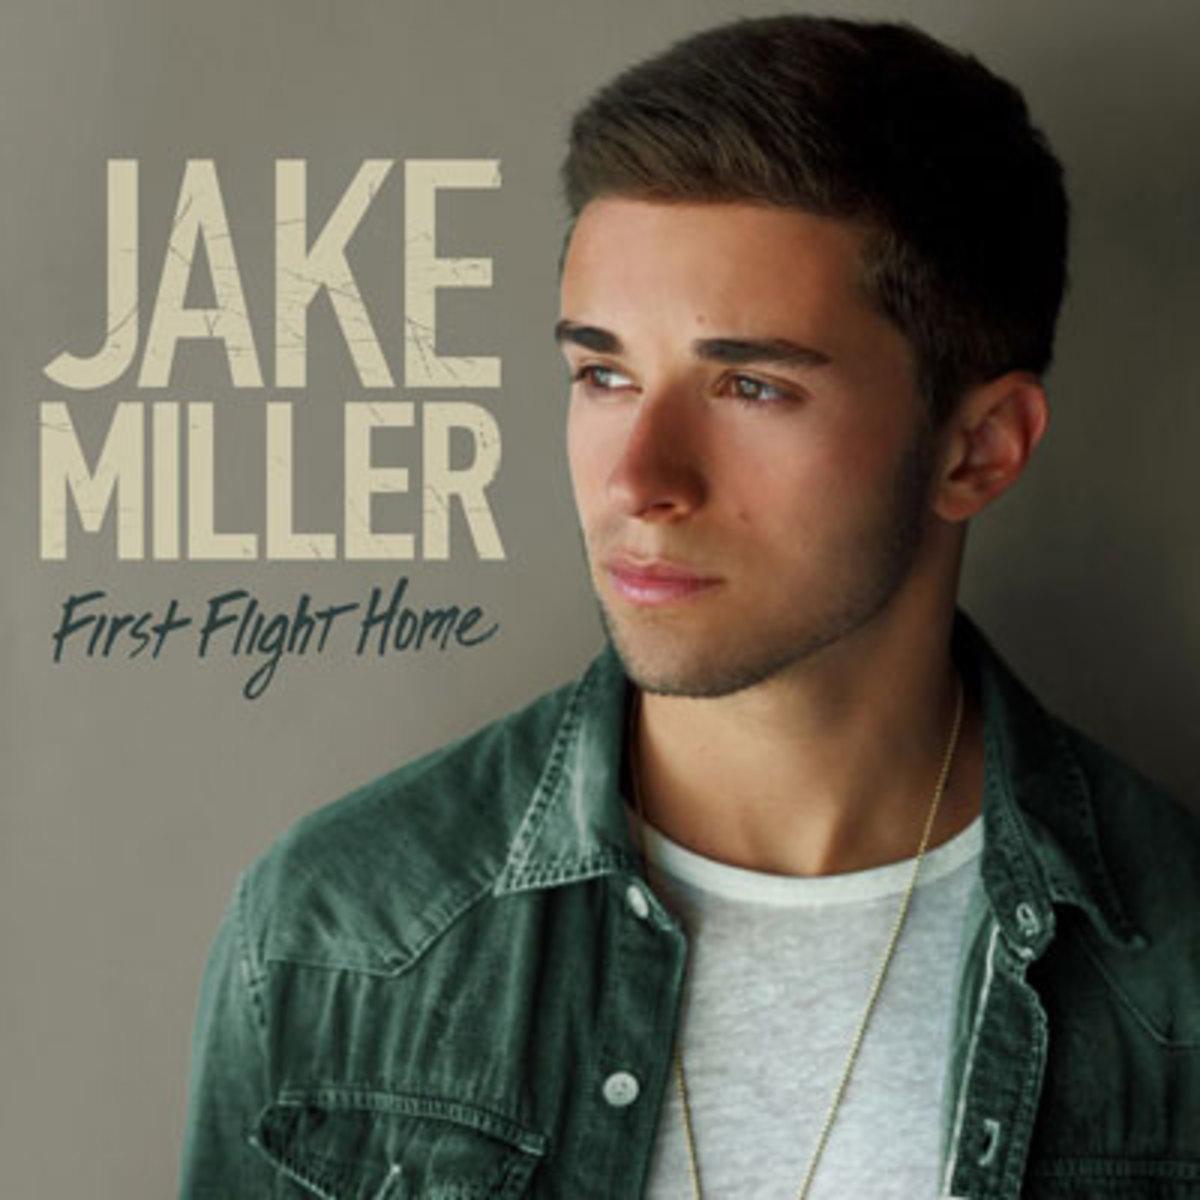 jakemiller-firstflighthome.jpg